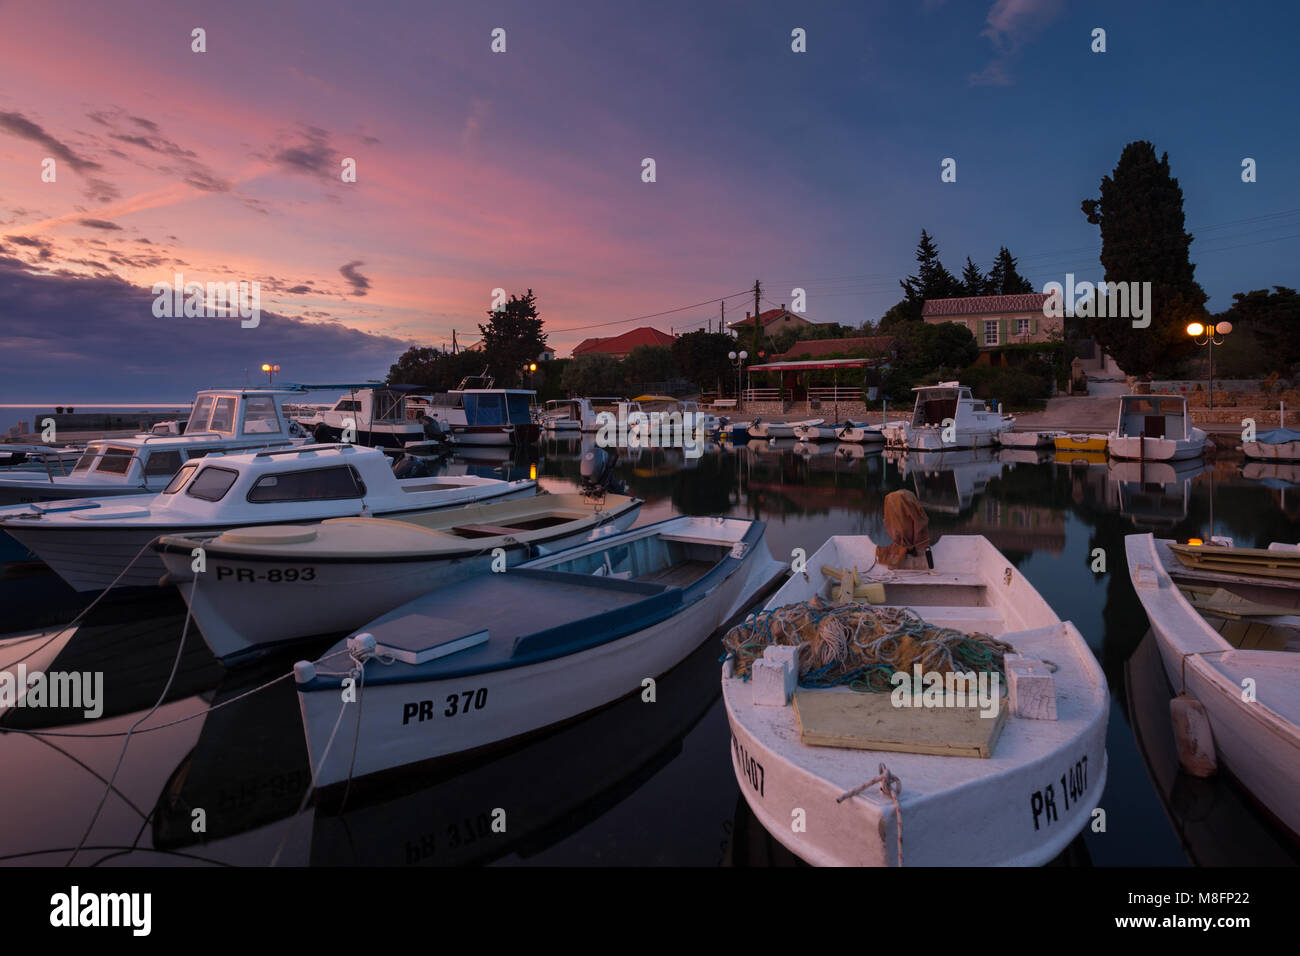 Piccola baia Ceprljanda in luogo Ugljan sull isola di Ugljan, Dalmazia, Croazia Immagini Stock